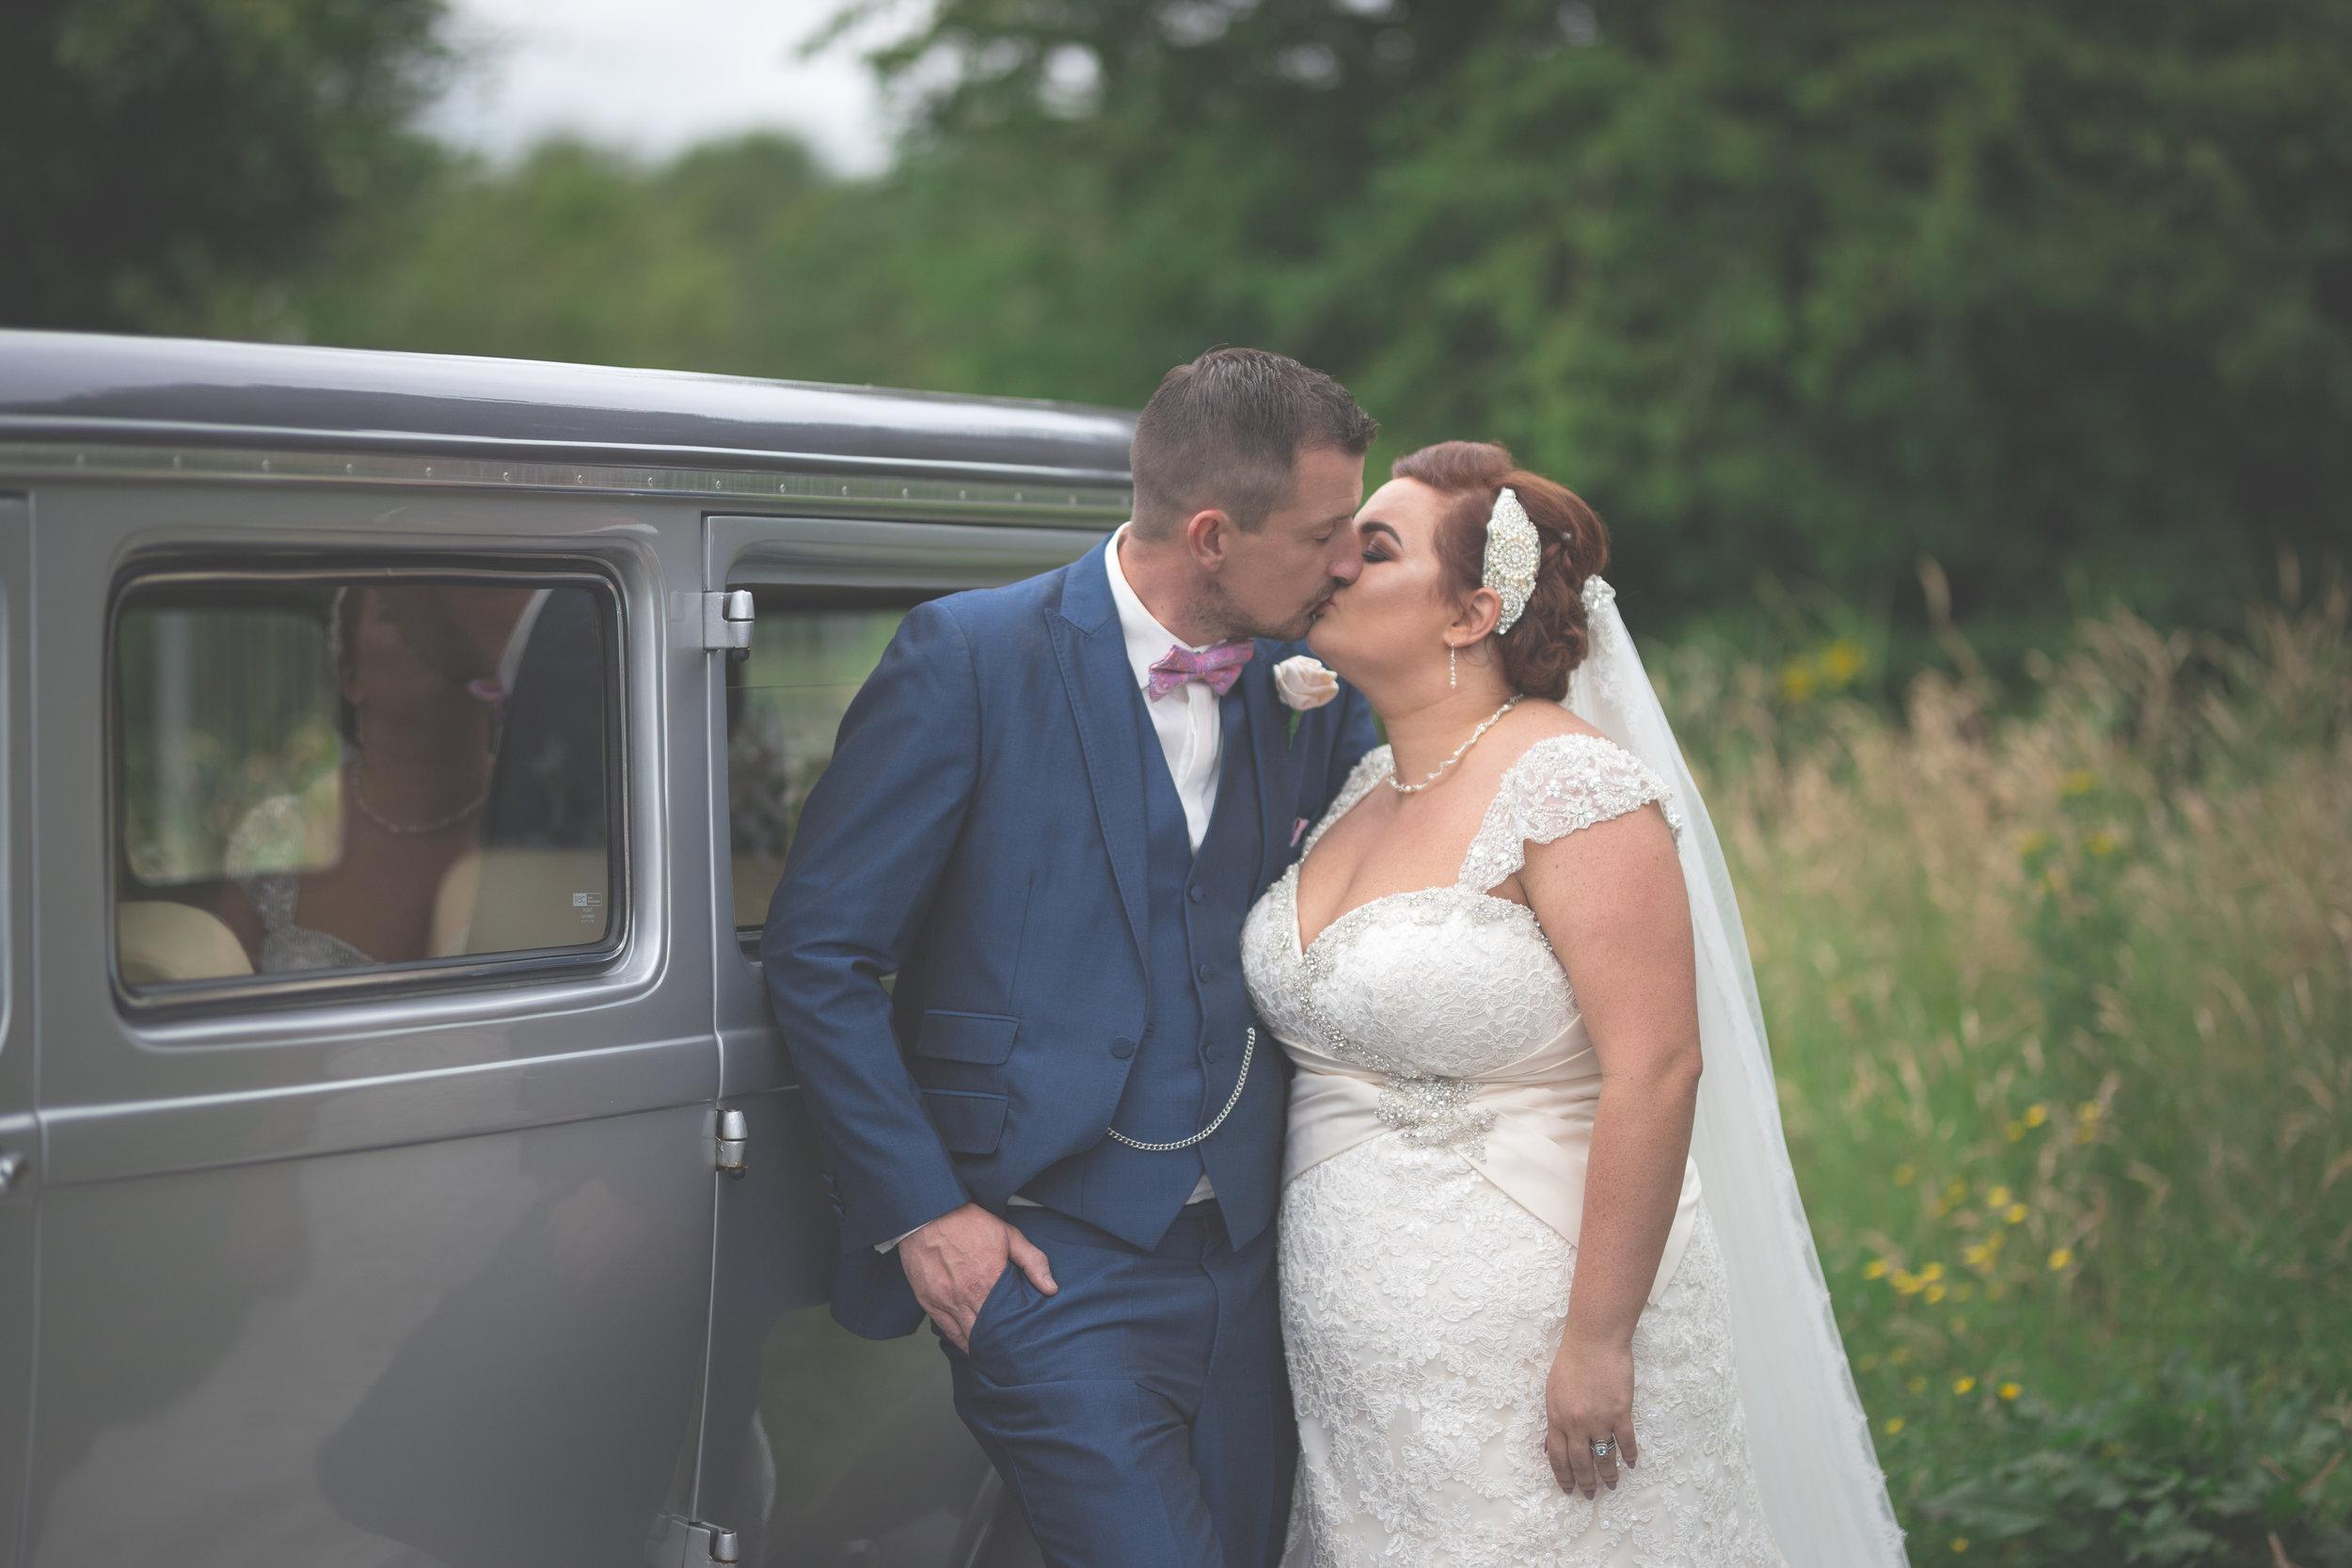 Antoinette & Stephen - Portraits   Brian McEwan Photography   Wedding Photographer Northern Ireland 36.jpg